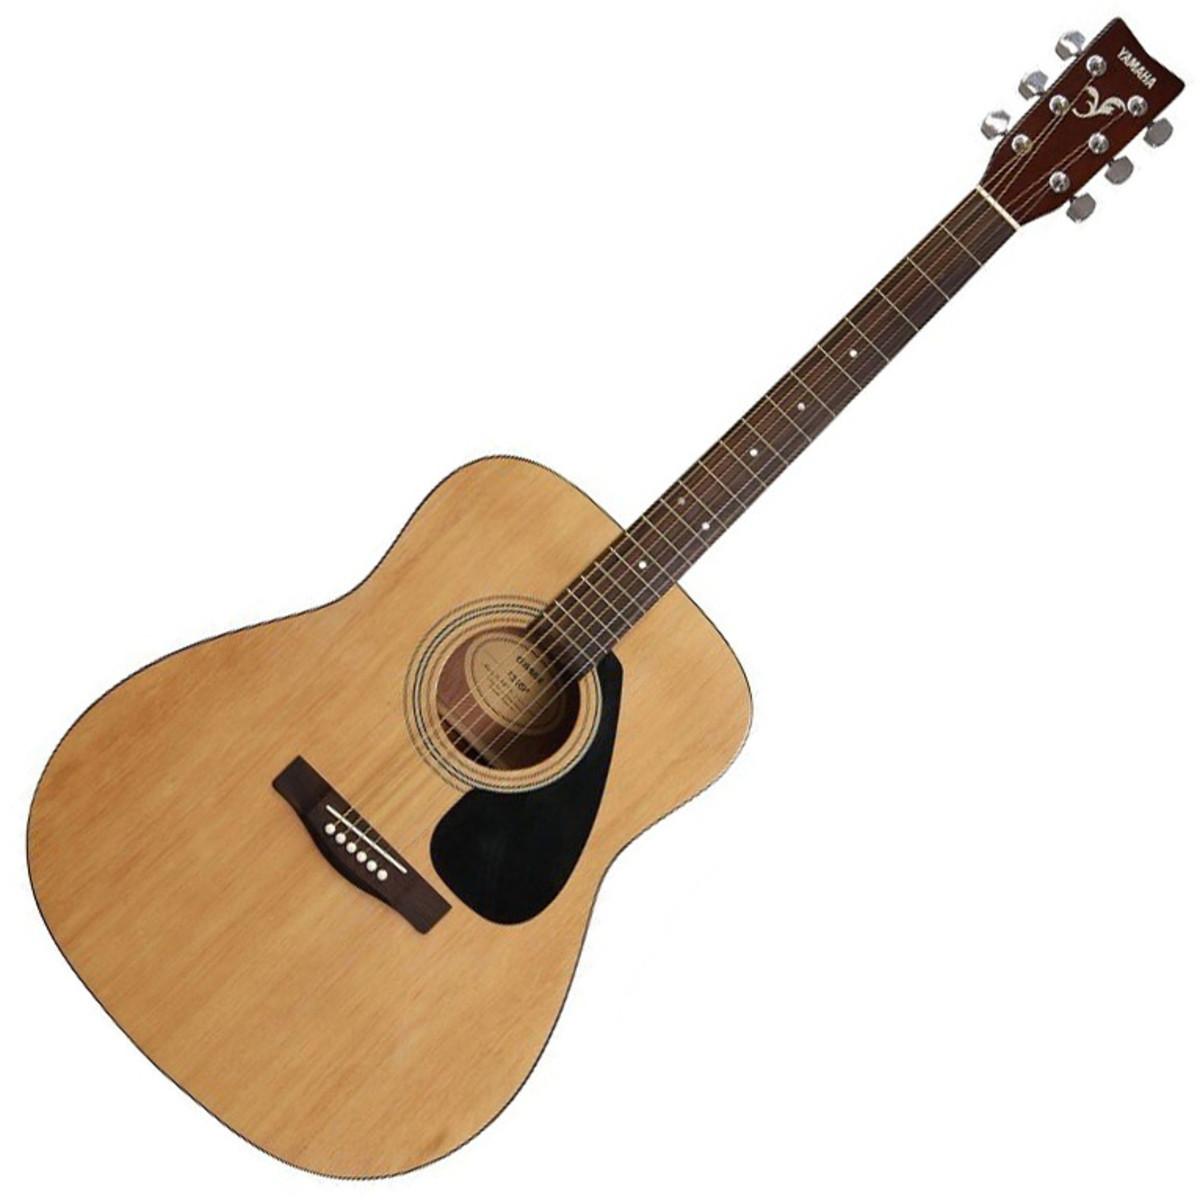 21b800d7b84 Yamaha F310 Acoustic Guitar, Natural - Nearly New. Loading zoom